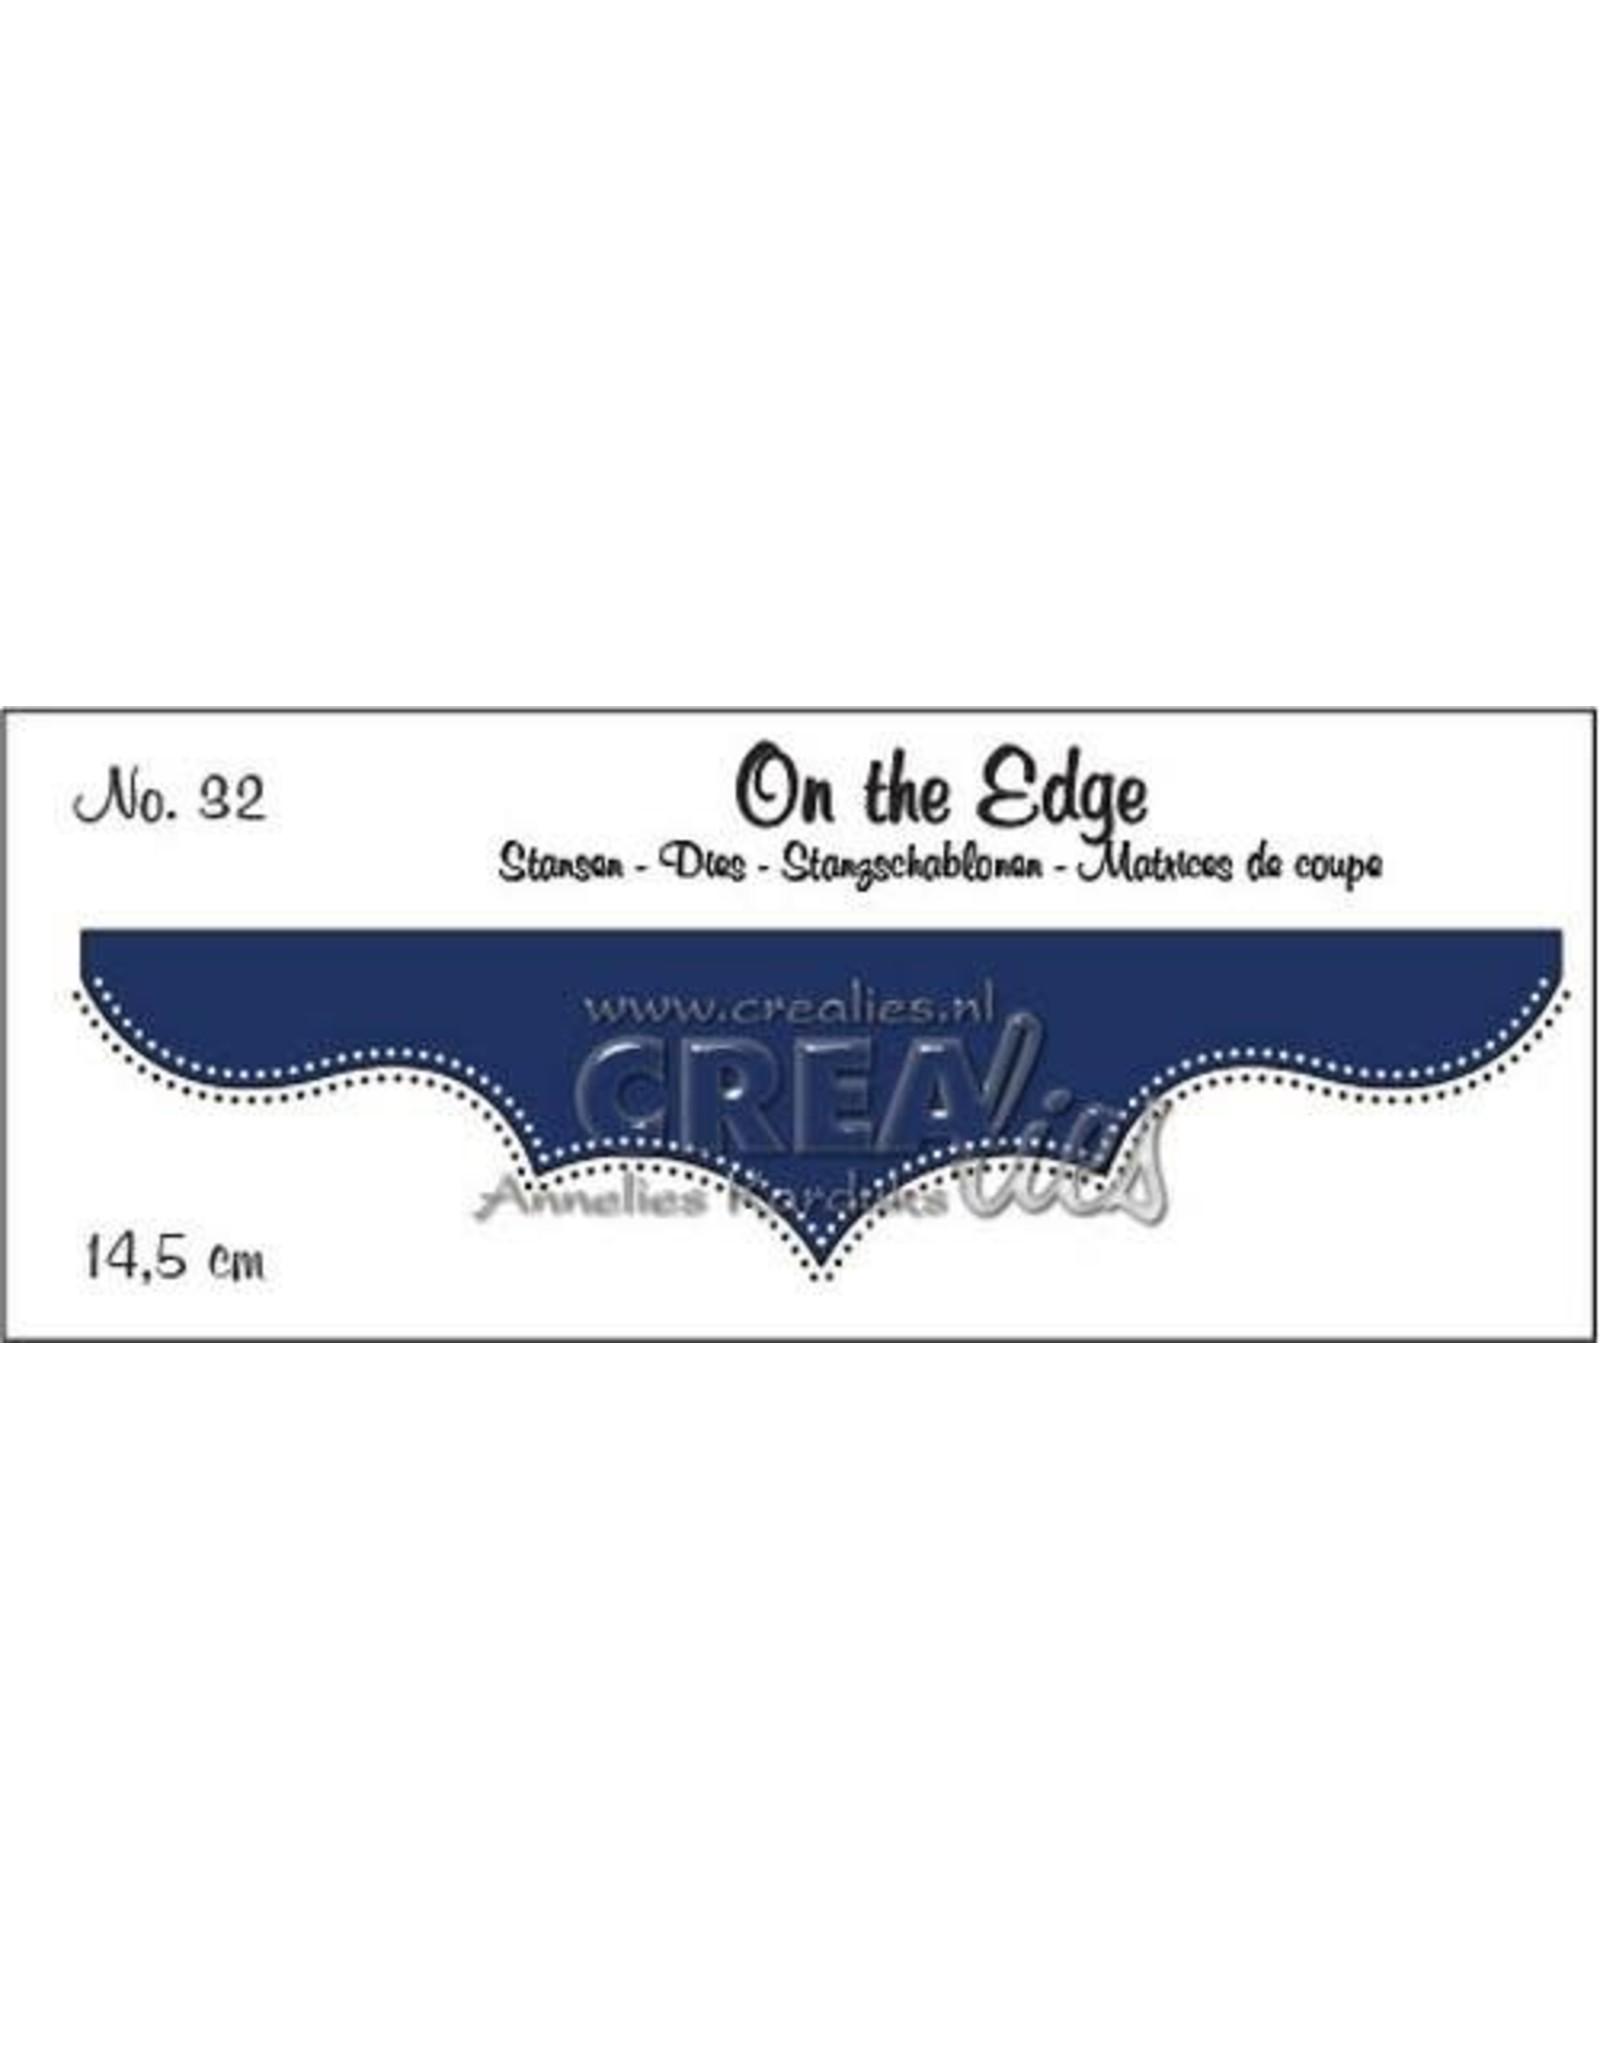 Crealies Crealies On the edge die stans no 32 CLOTE32